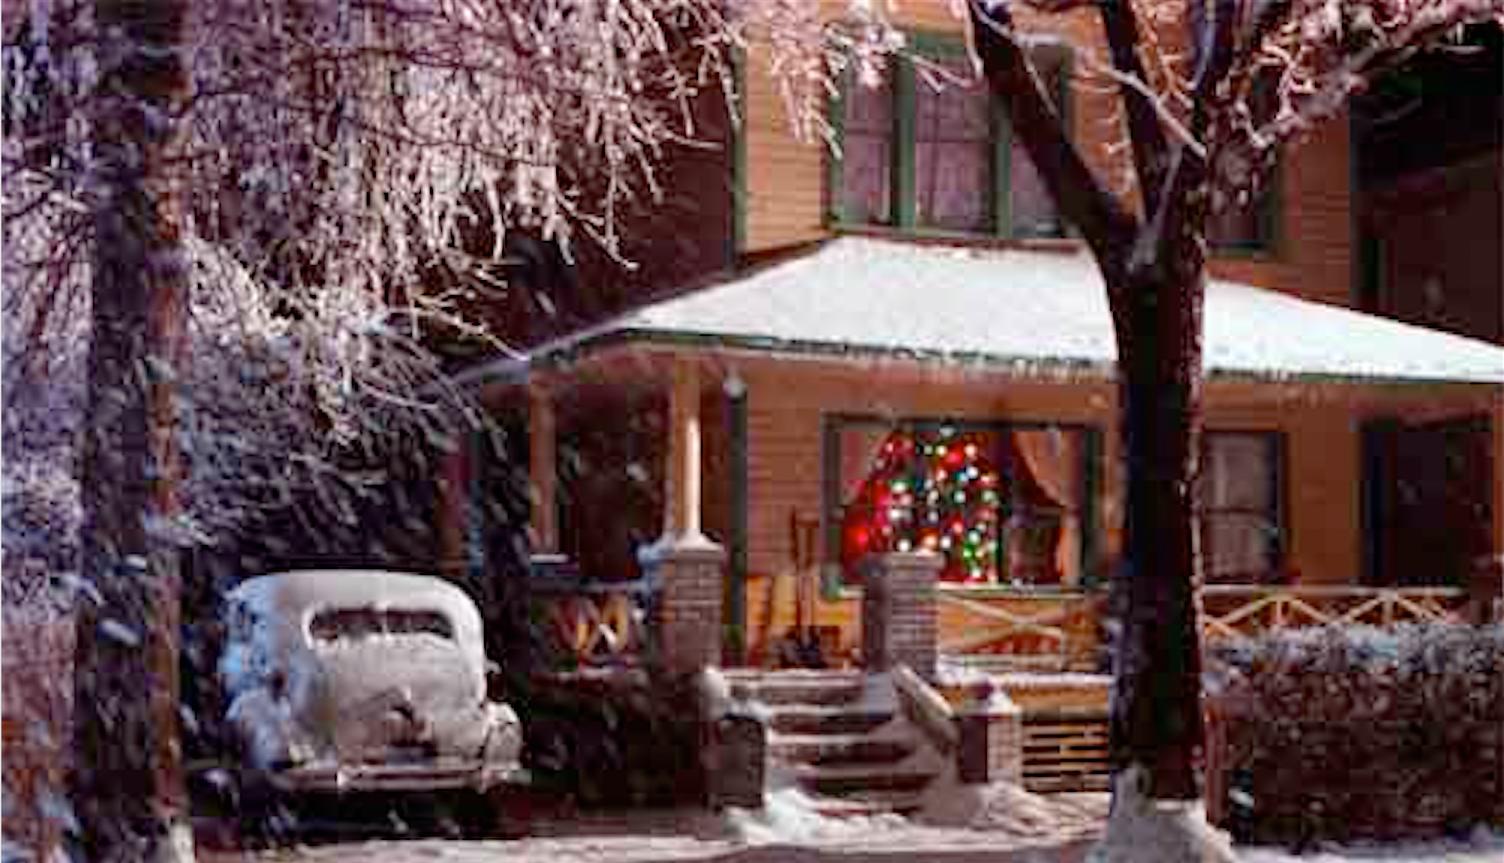 a christmas story house - A Christmas Story Time Period